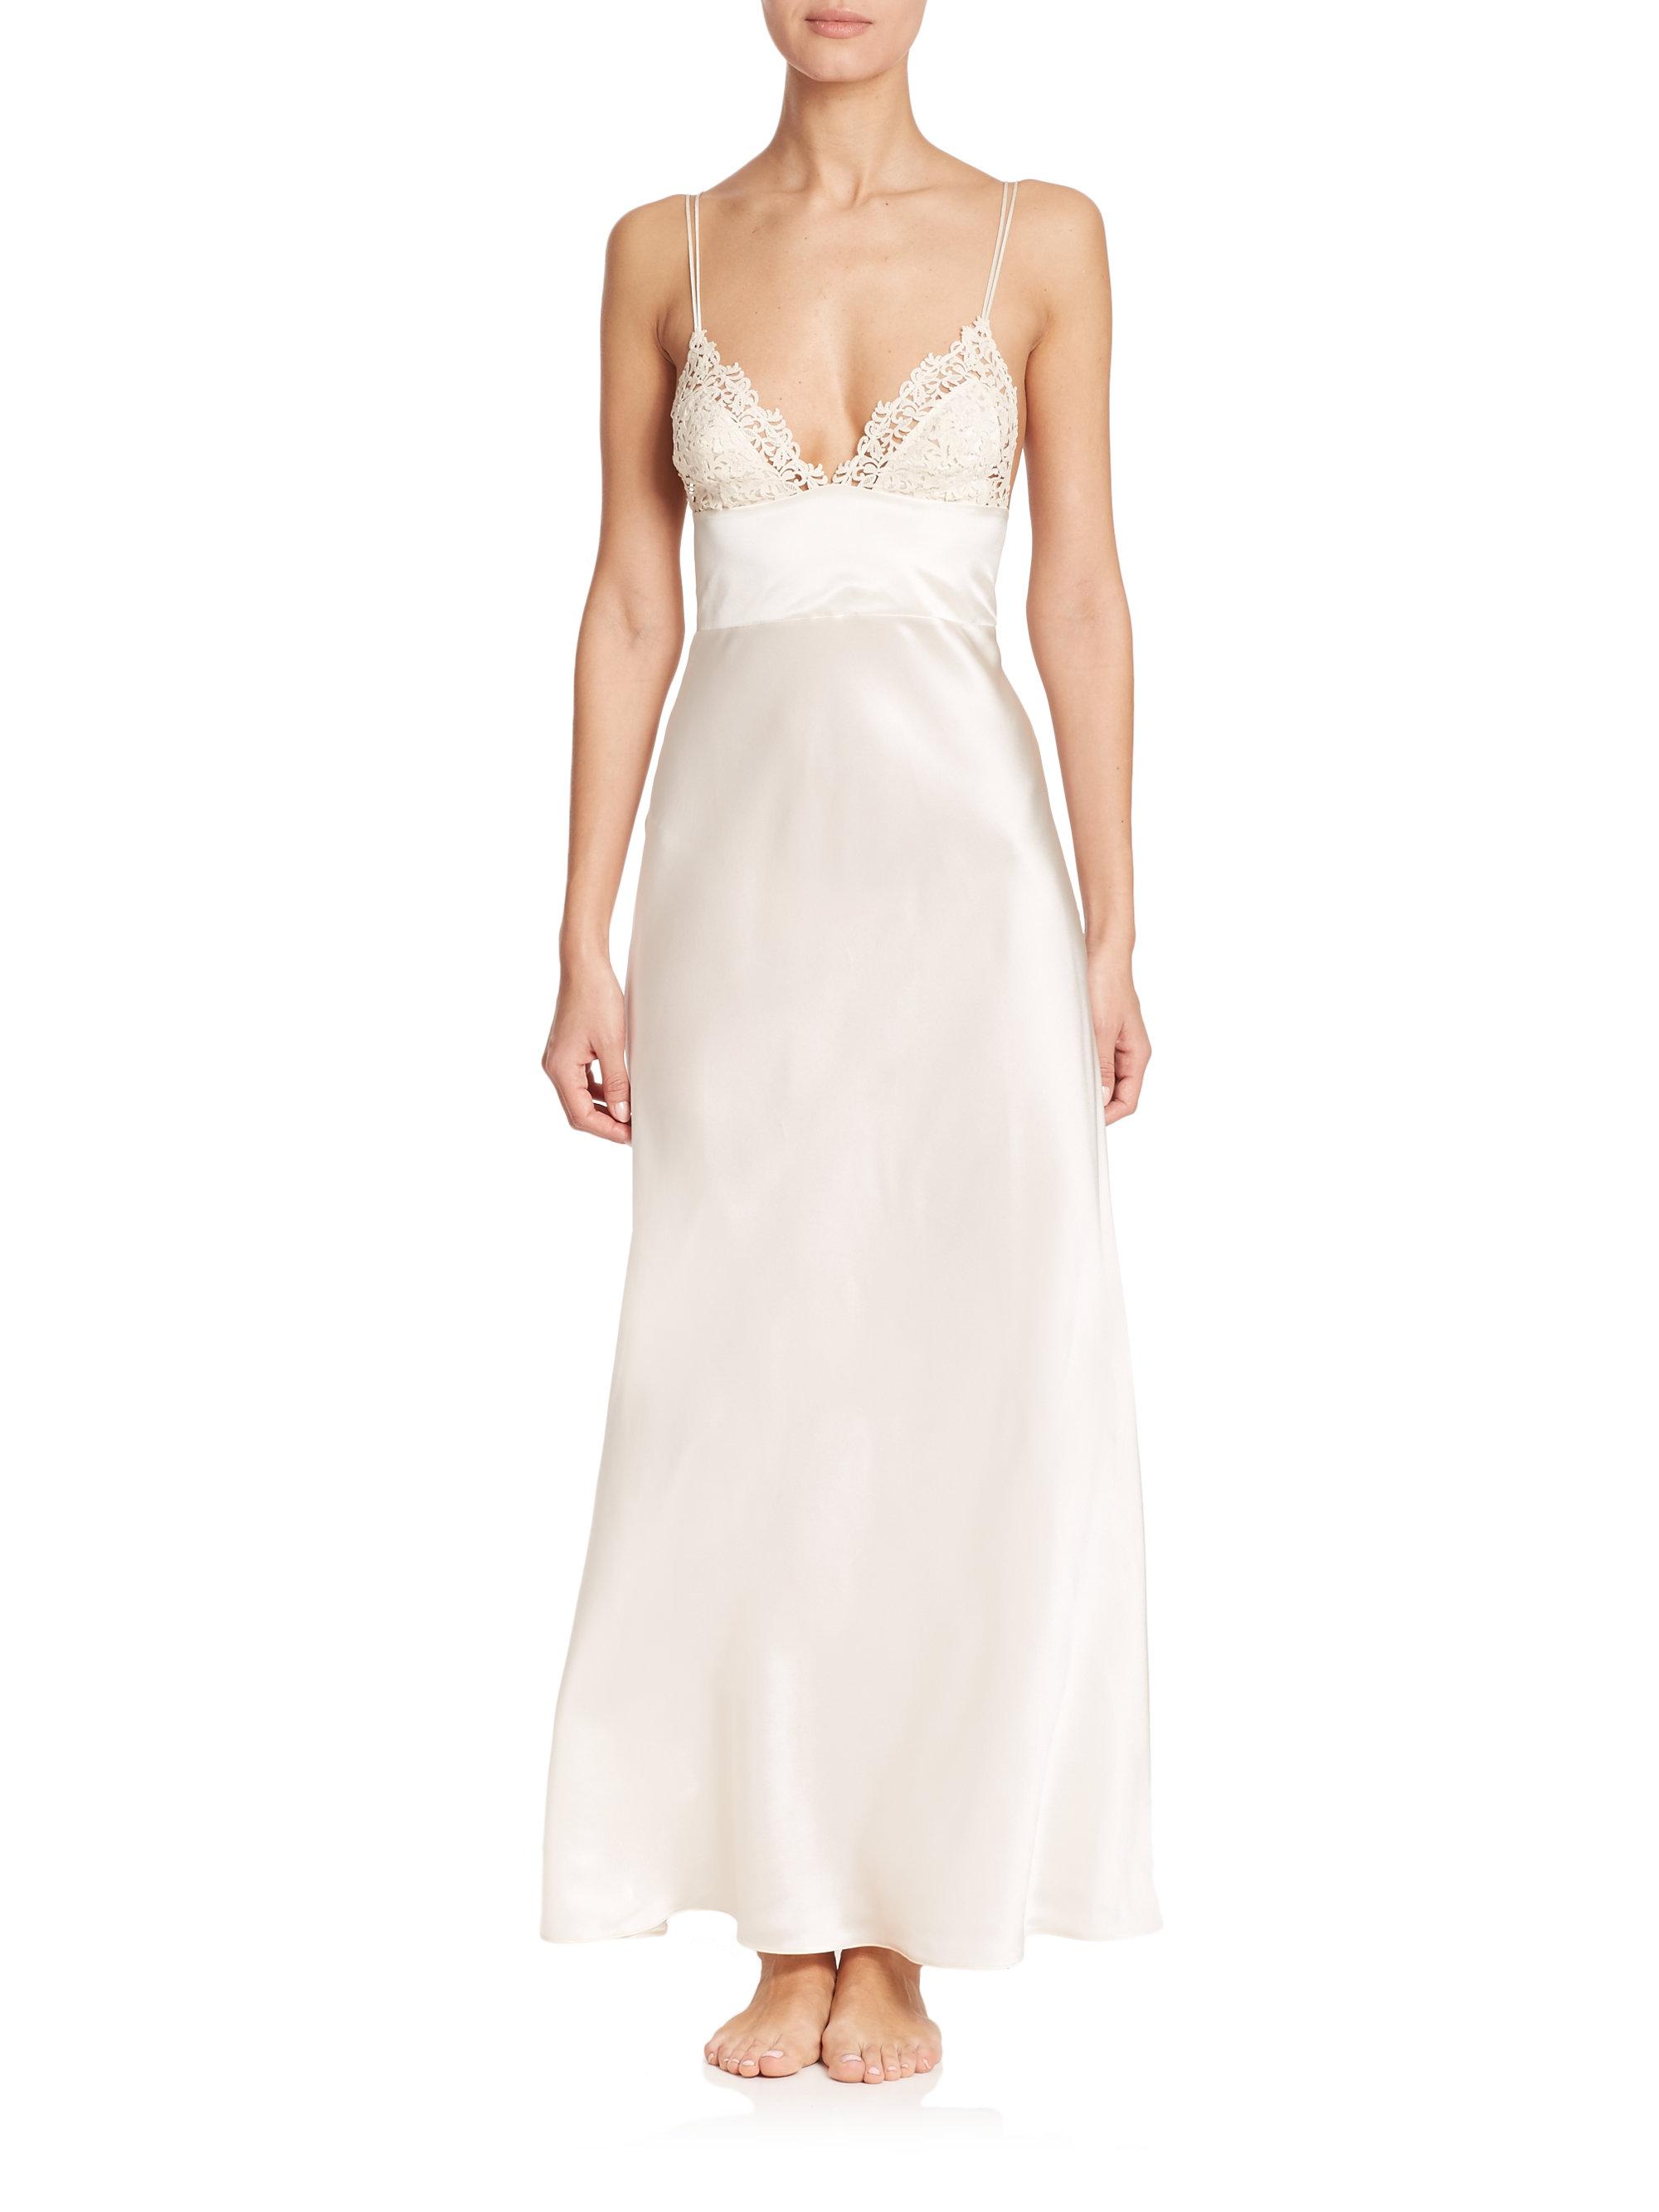 Lyst - La Perla Lace-trimmed Silk Nightgown in Natural